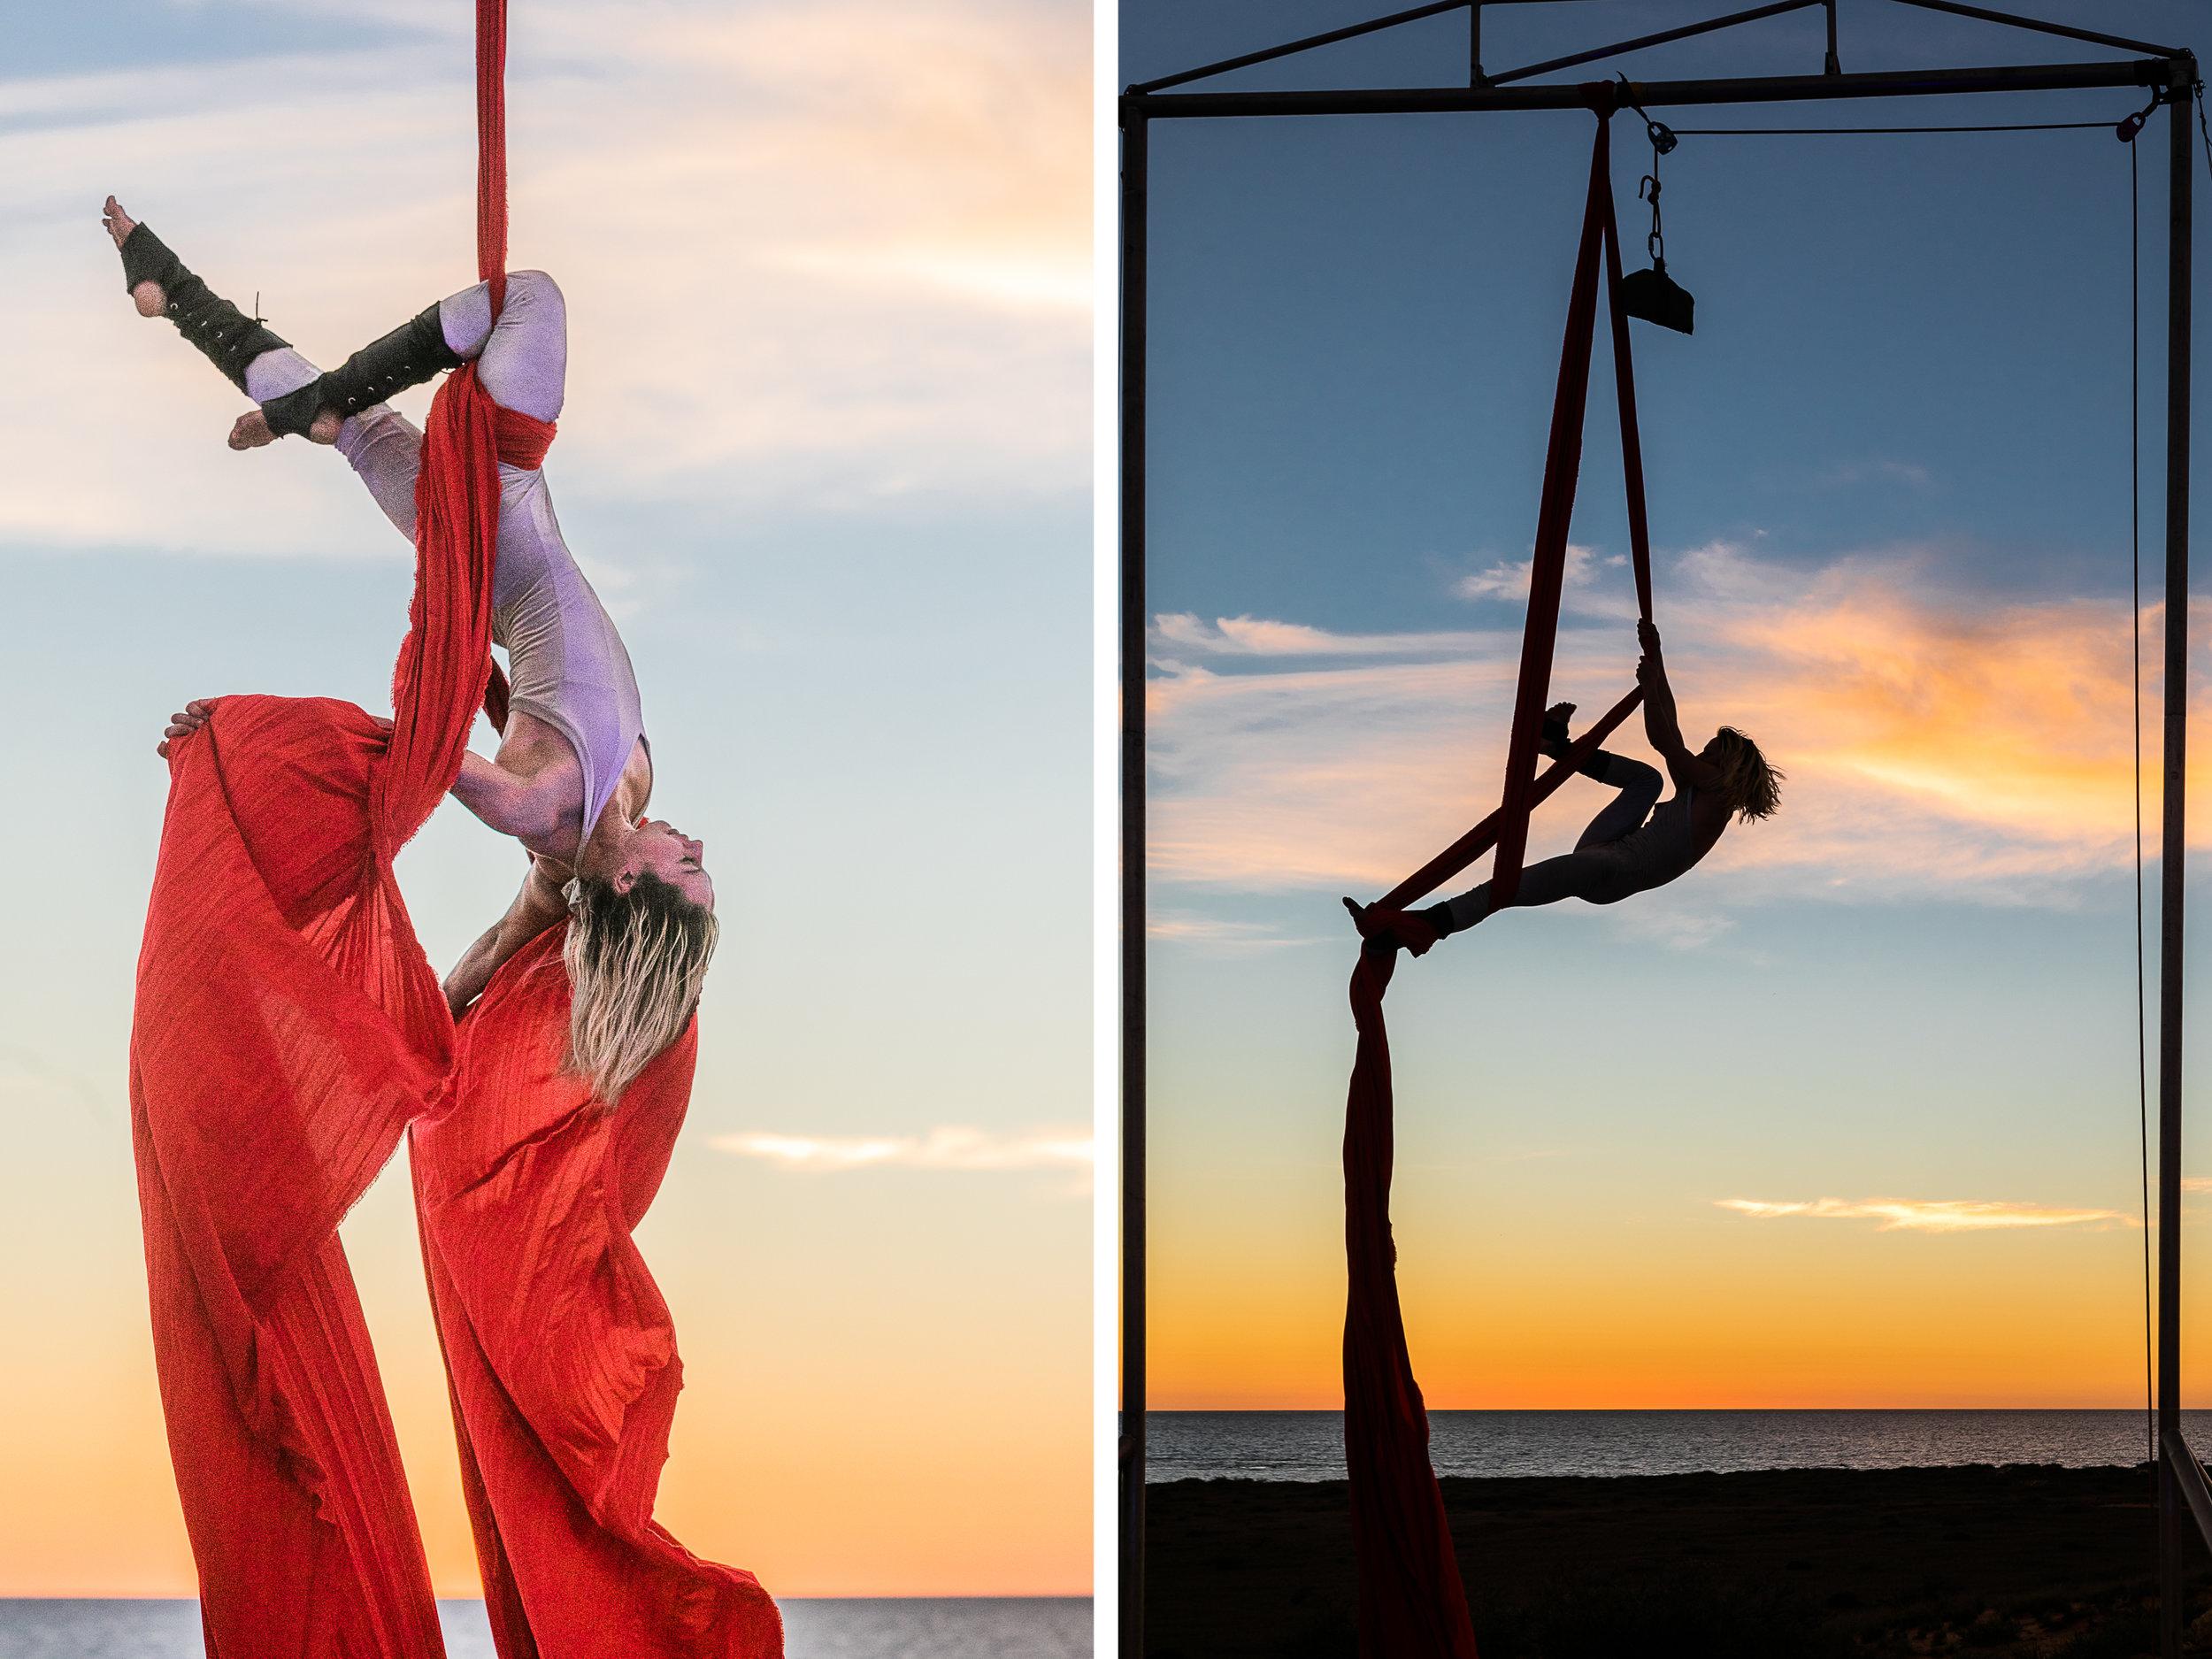 Aerialist Jade Mills rehearsing at sunset